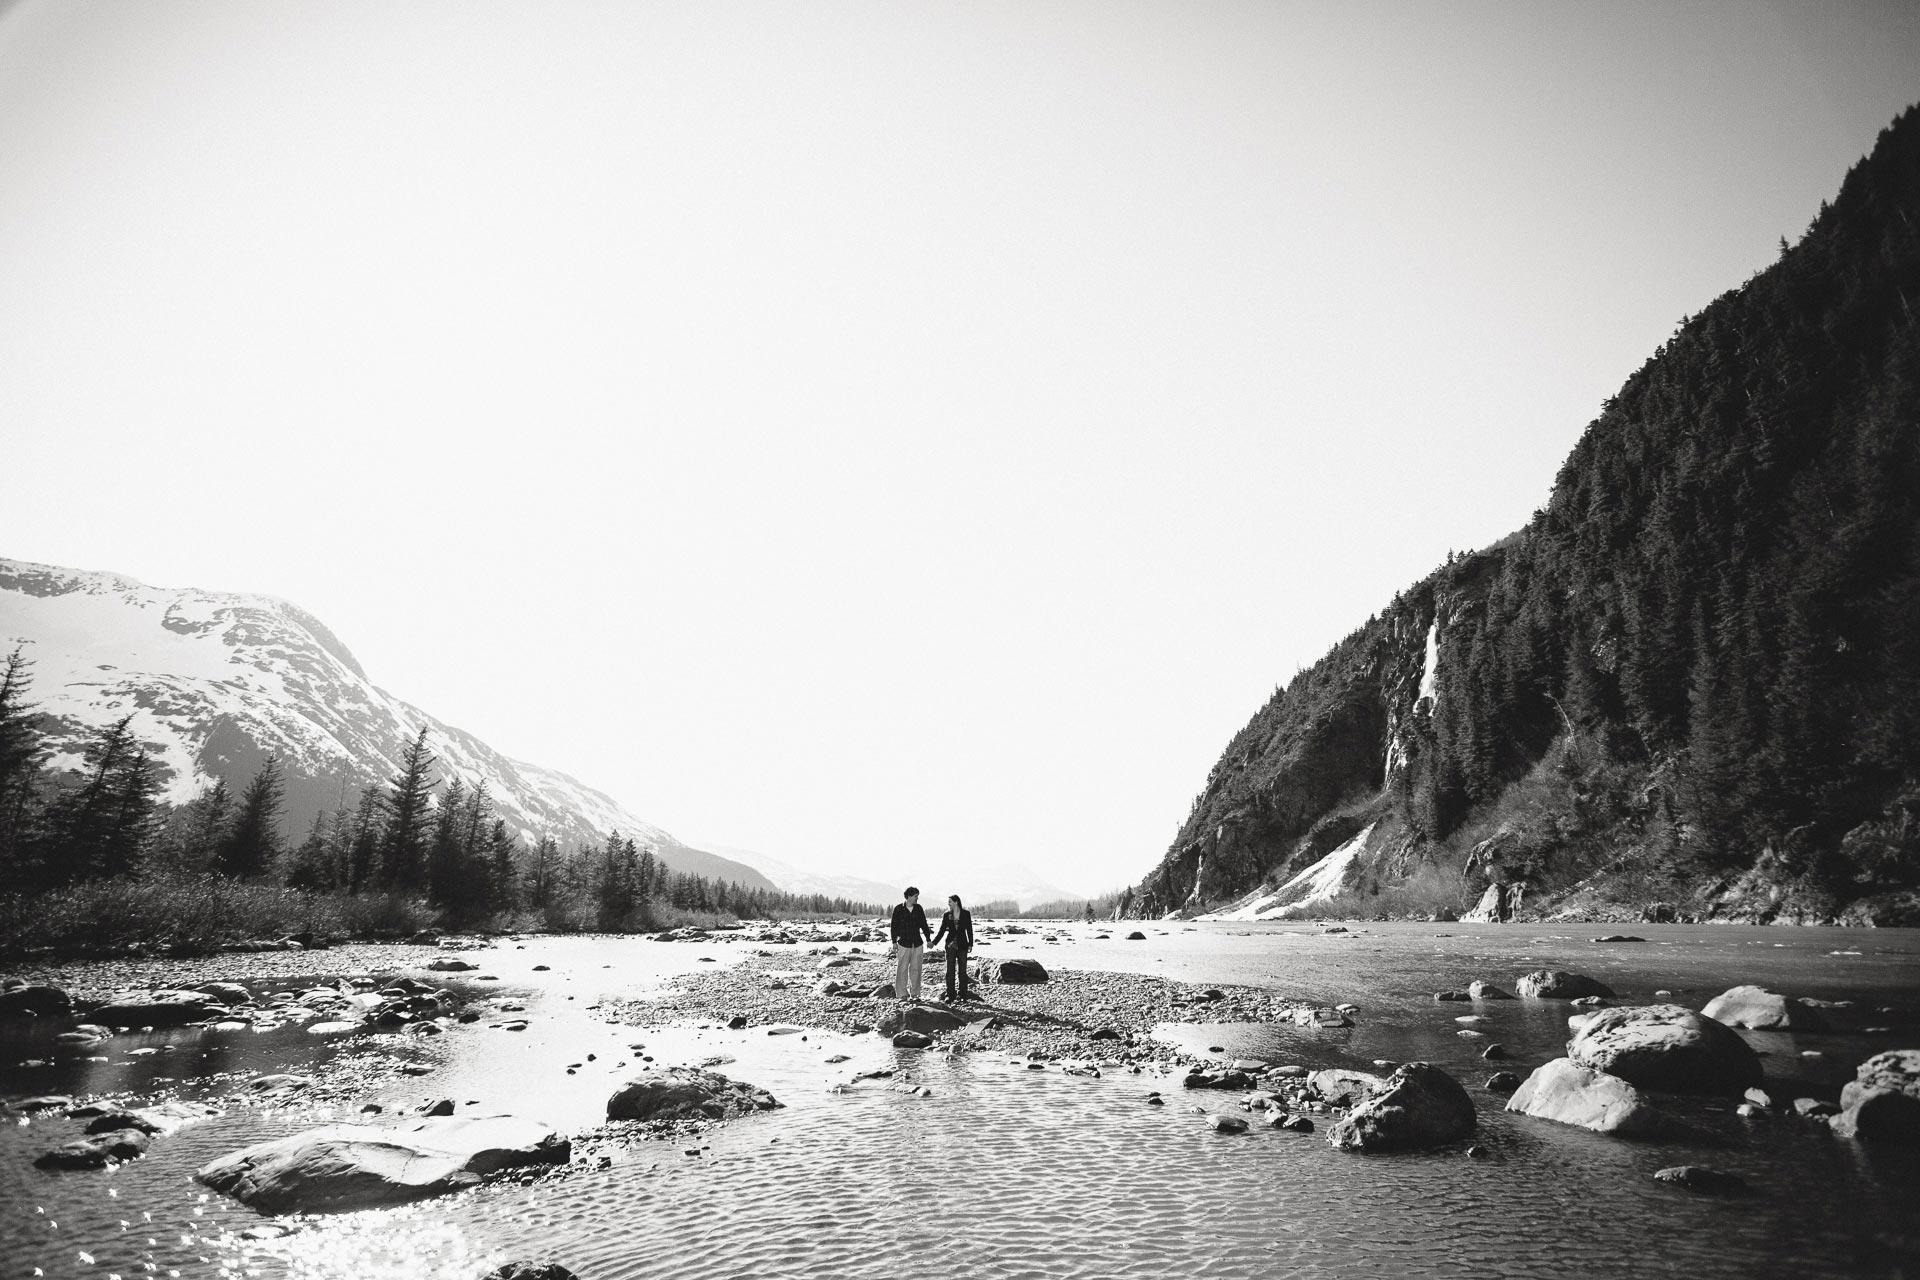 LP-Alaska-Engagement-022@2x.jpg